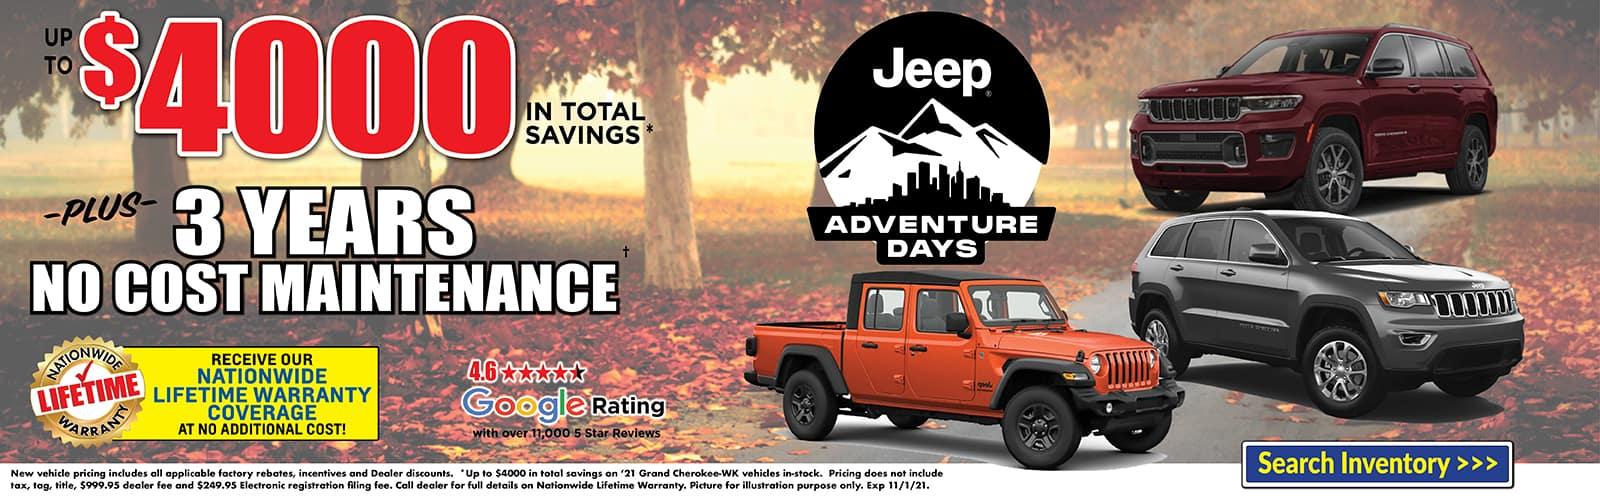 jeep slide